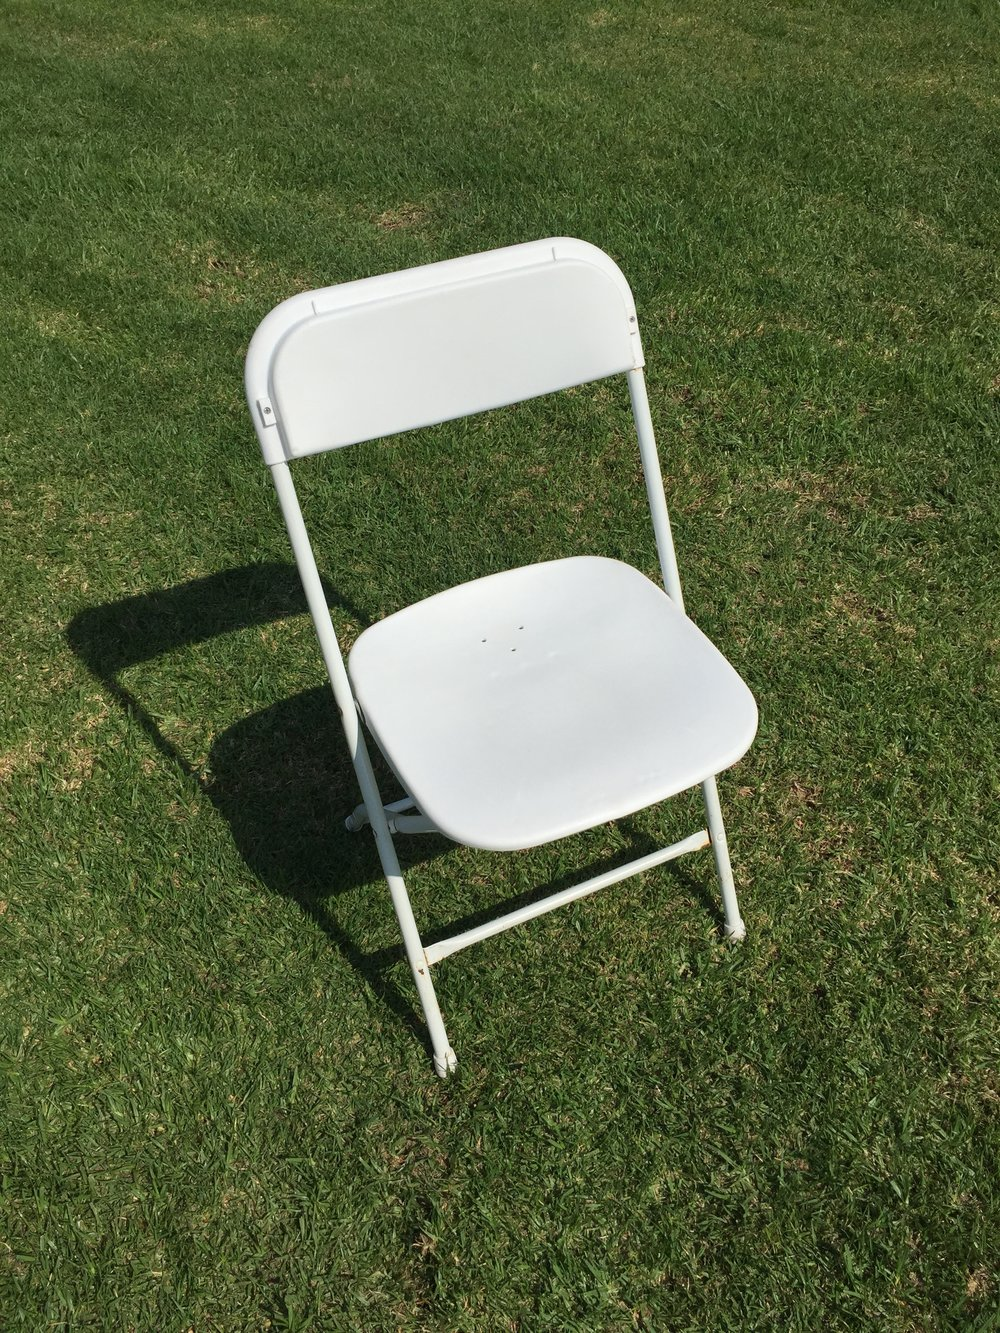 White-Plastic-Folding-Chair-1-300x225.jpg